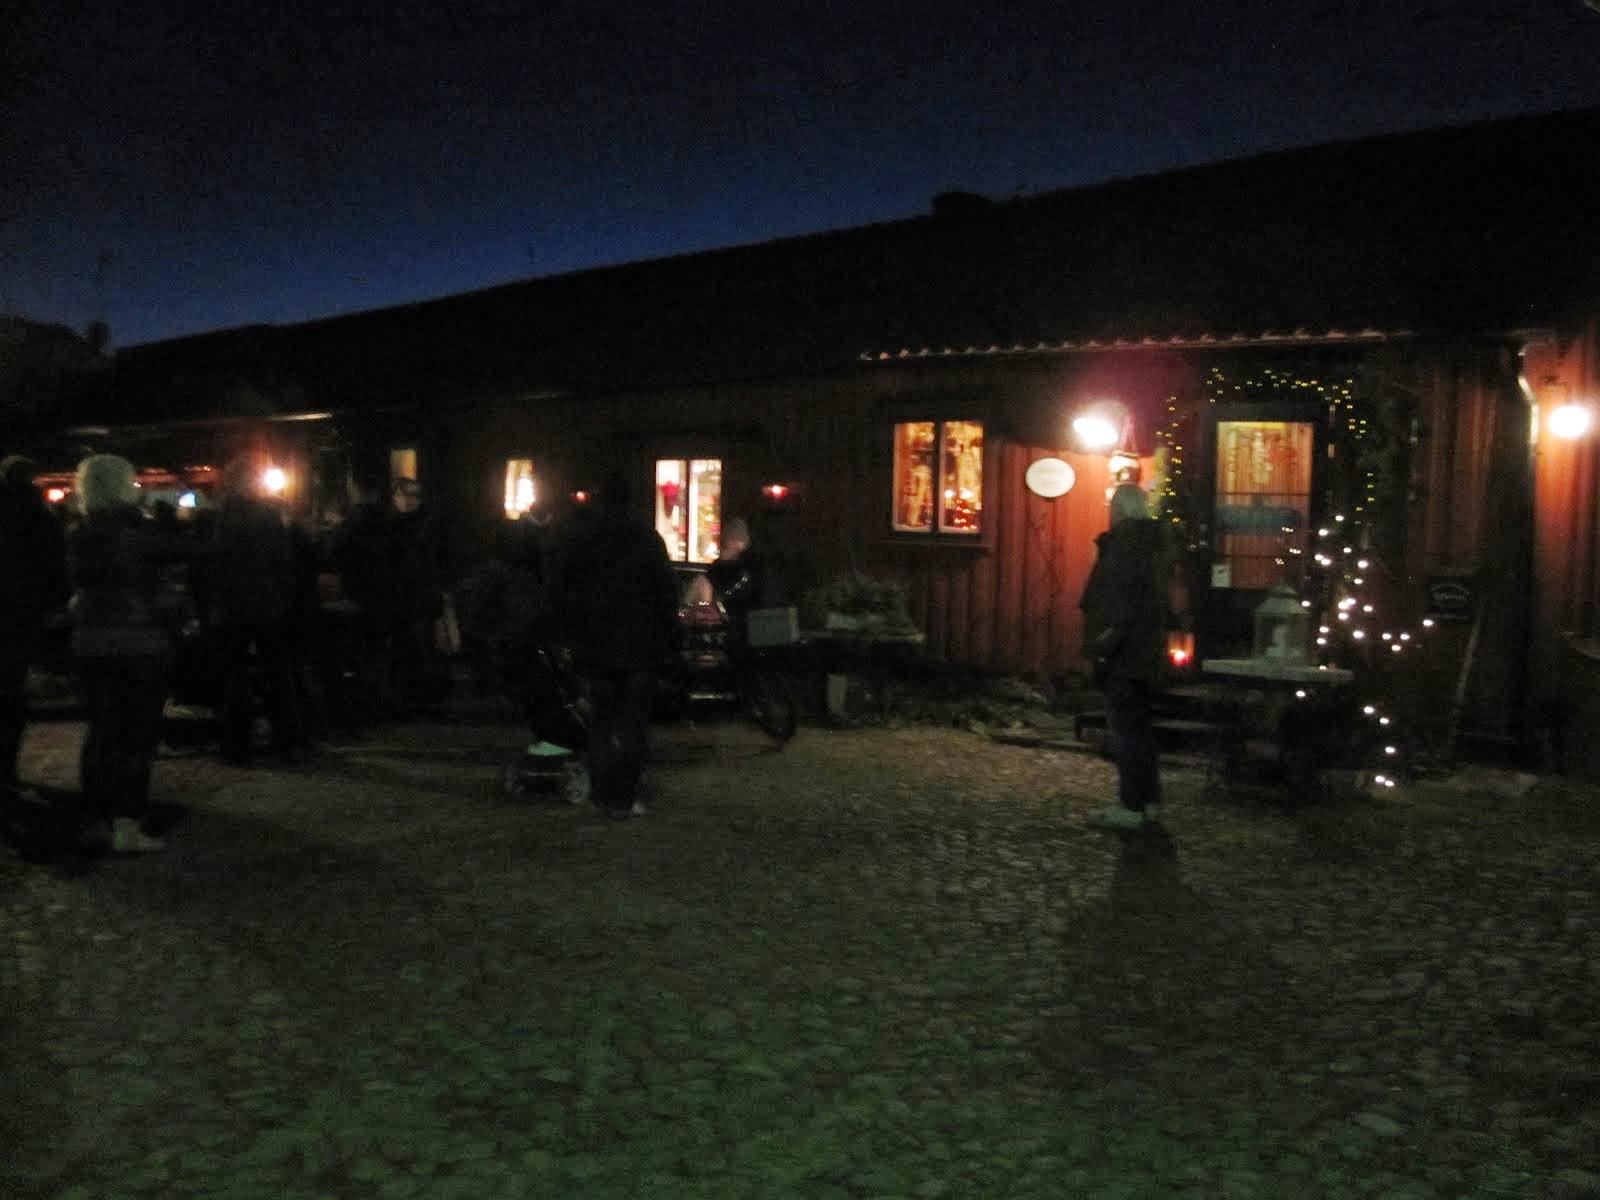 Atelje Skärvan